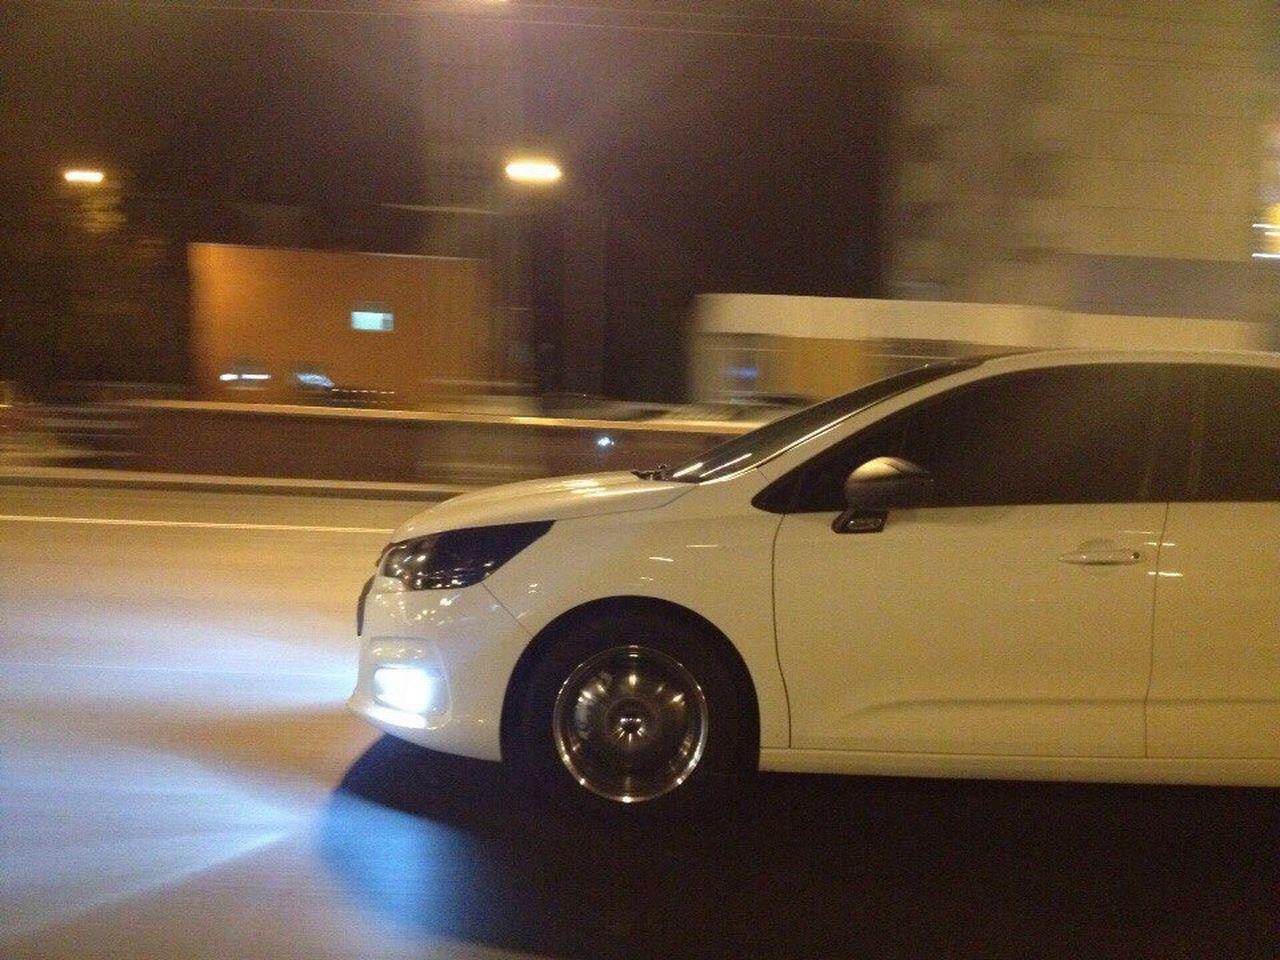 car, night, transportation, illuminated, land vehicle, mode of transport, no people, outdoors